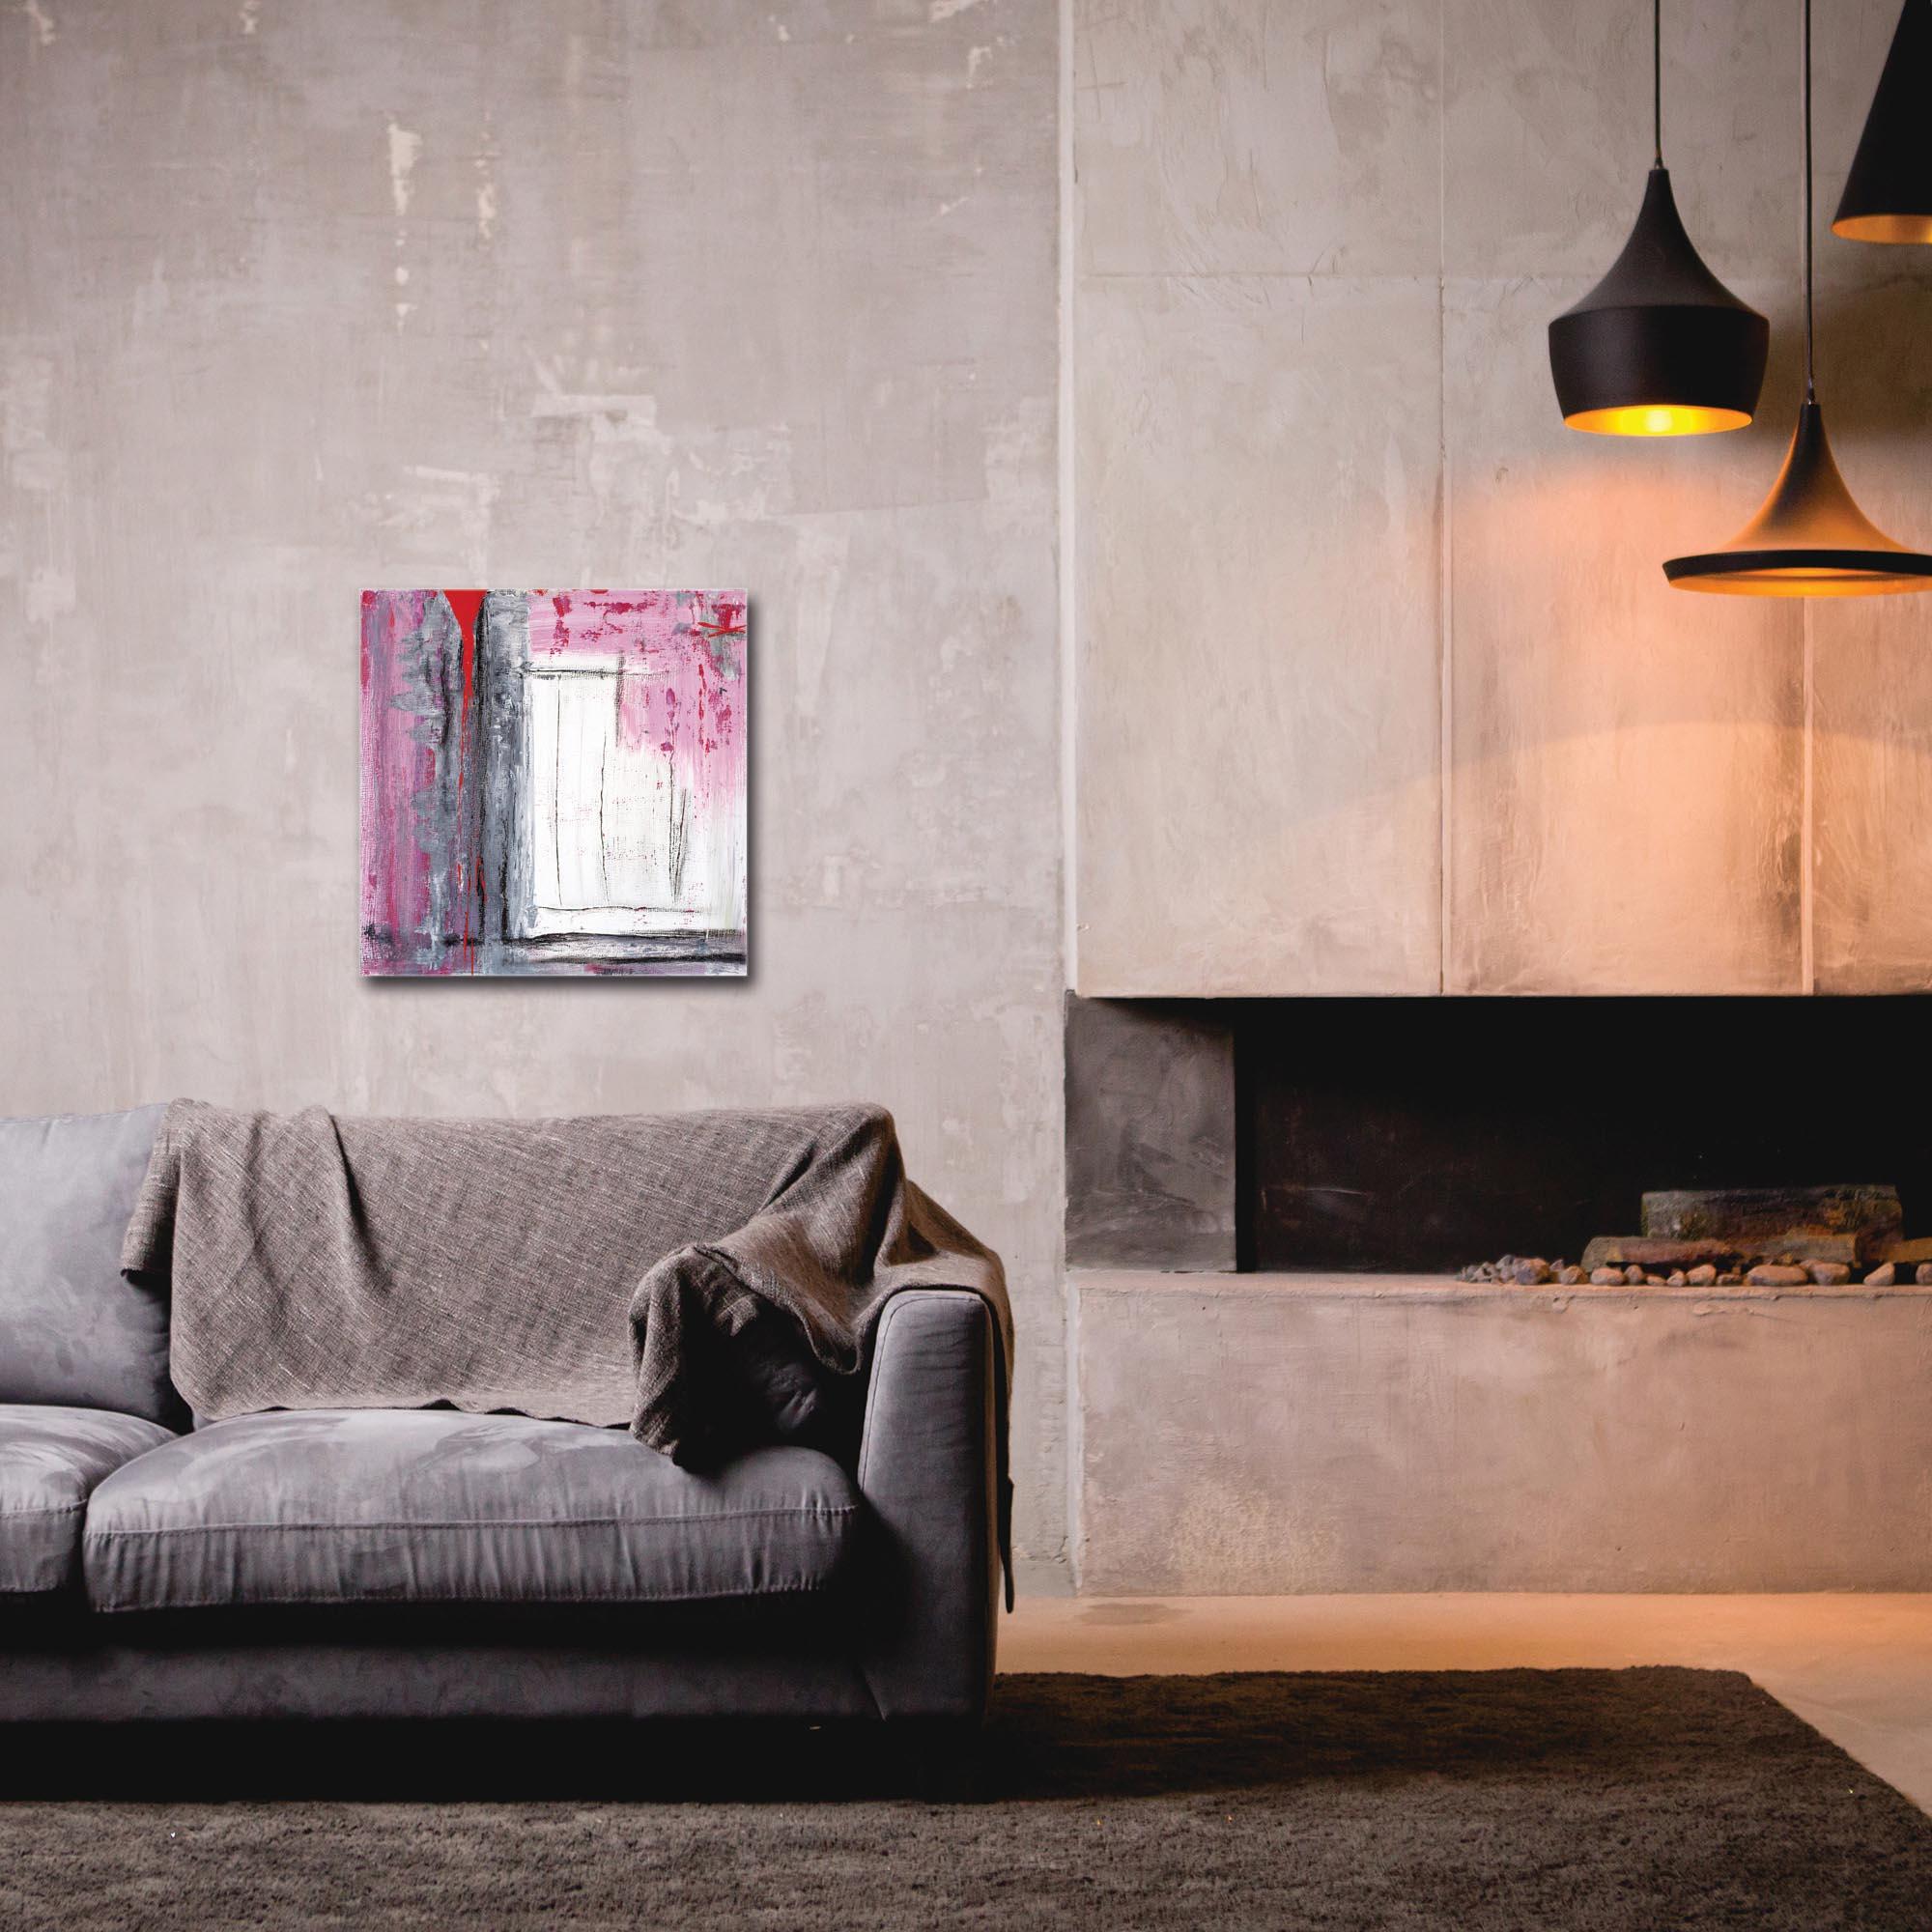 Abstract Wall Art 'Urban Life 5' - Urban Decor on Metal or Plexiglass - Image 3